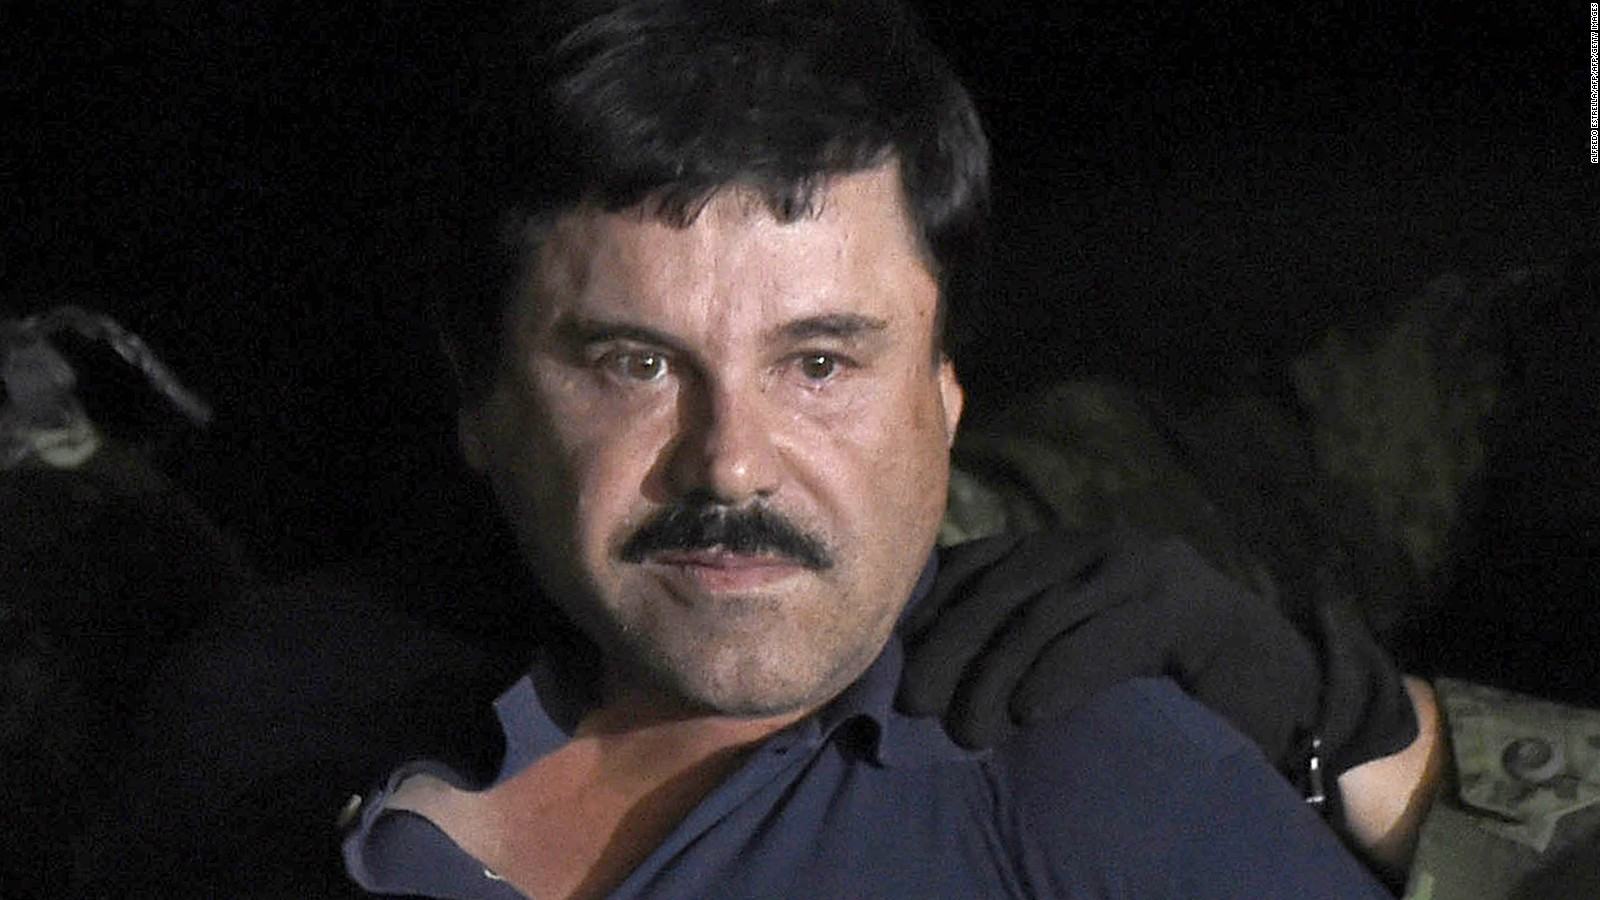 El FBI recluta a capos extraditados, para garantizar que el gran jurado le dé cadena perpetua a El Chapo